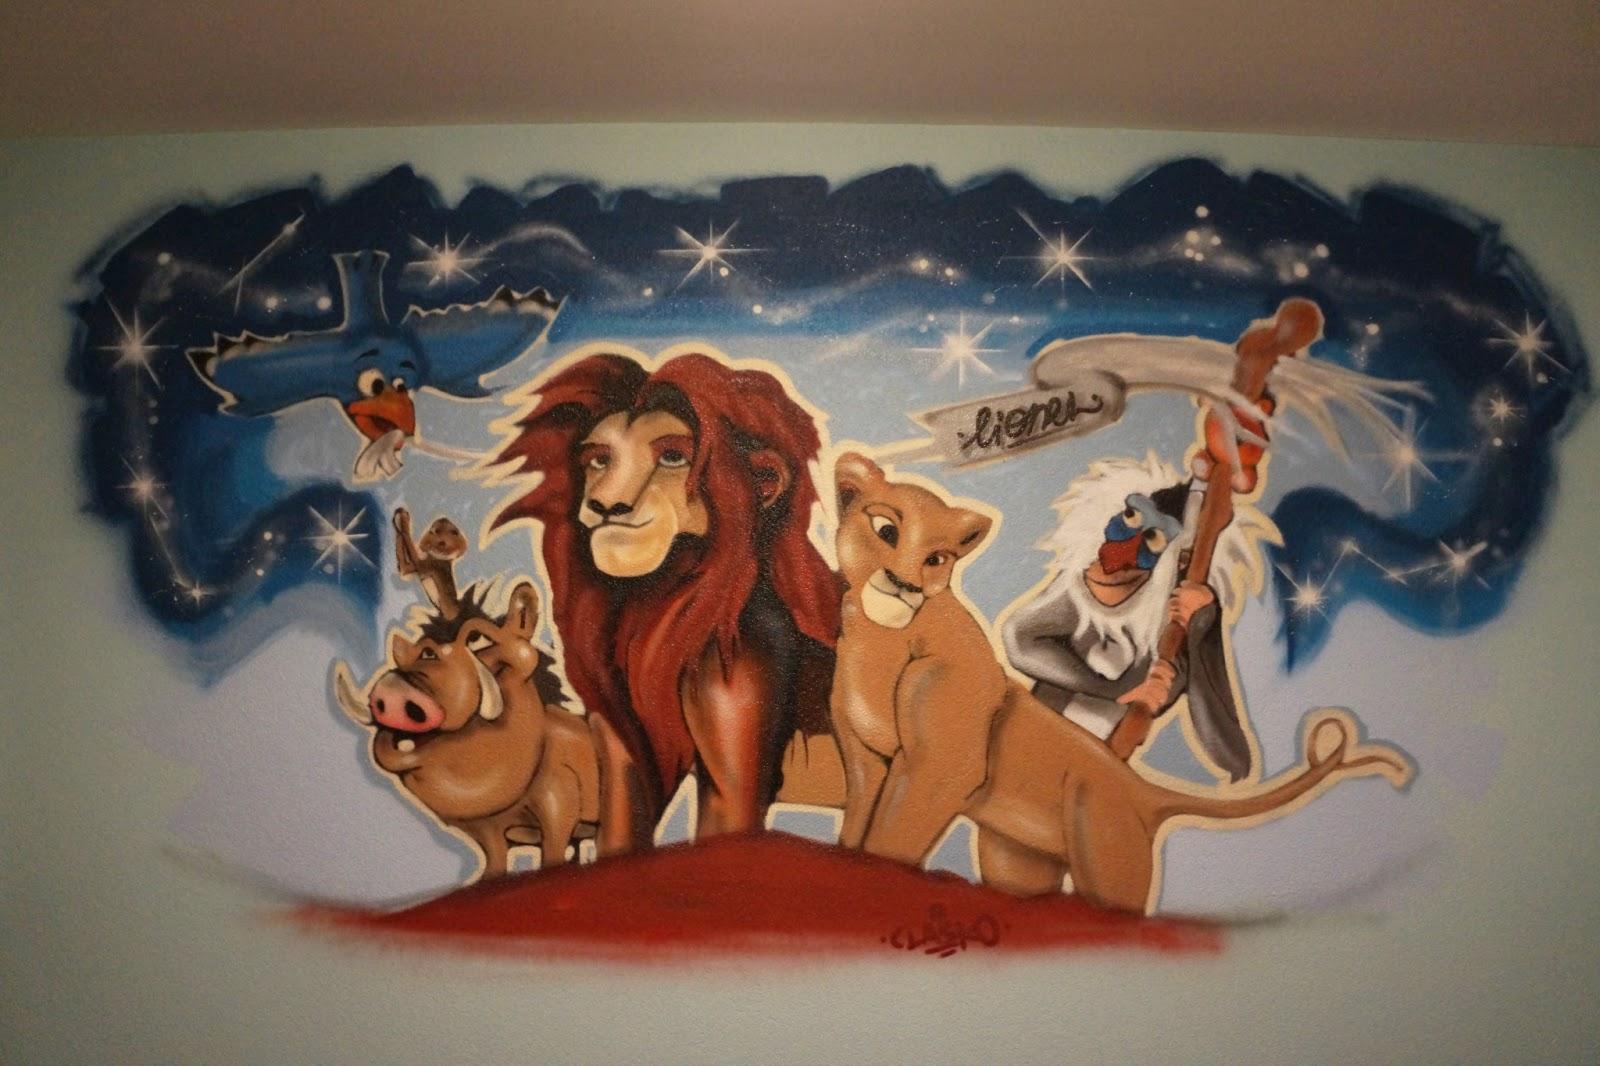 Graffiti Sprayer Schweiz: Graffiti Kinderzimmer: König der Löwen